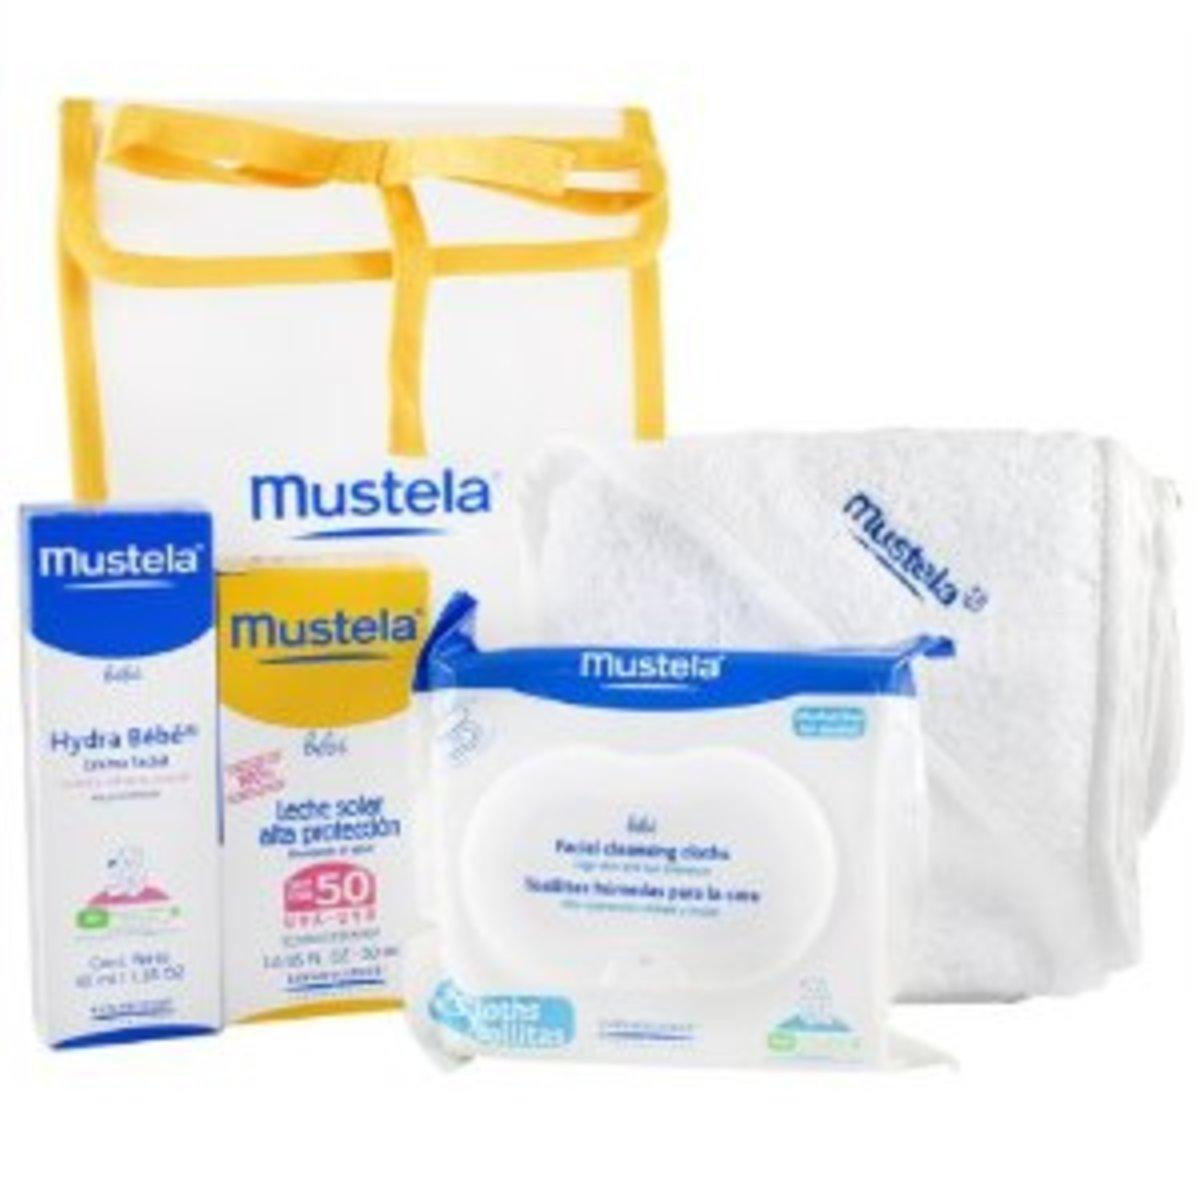 mustela_